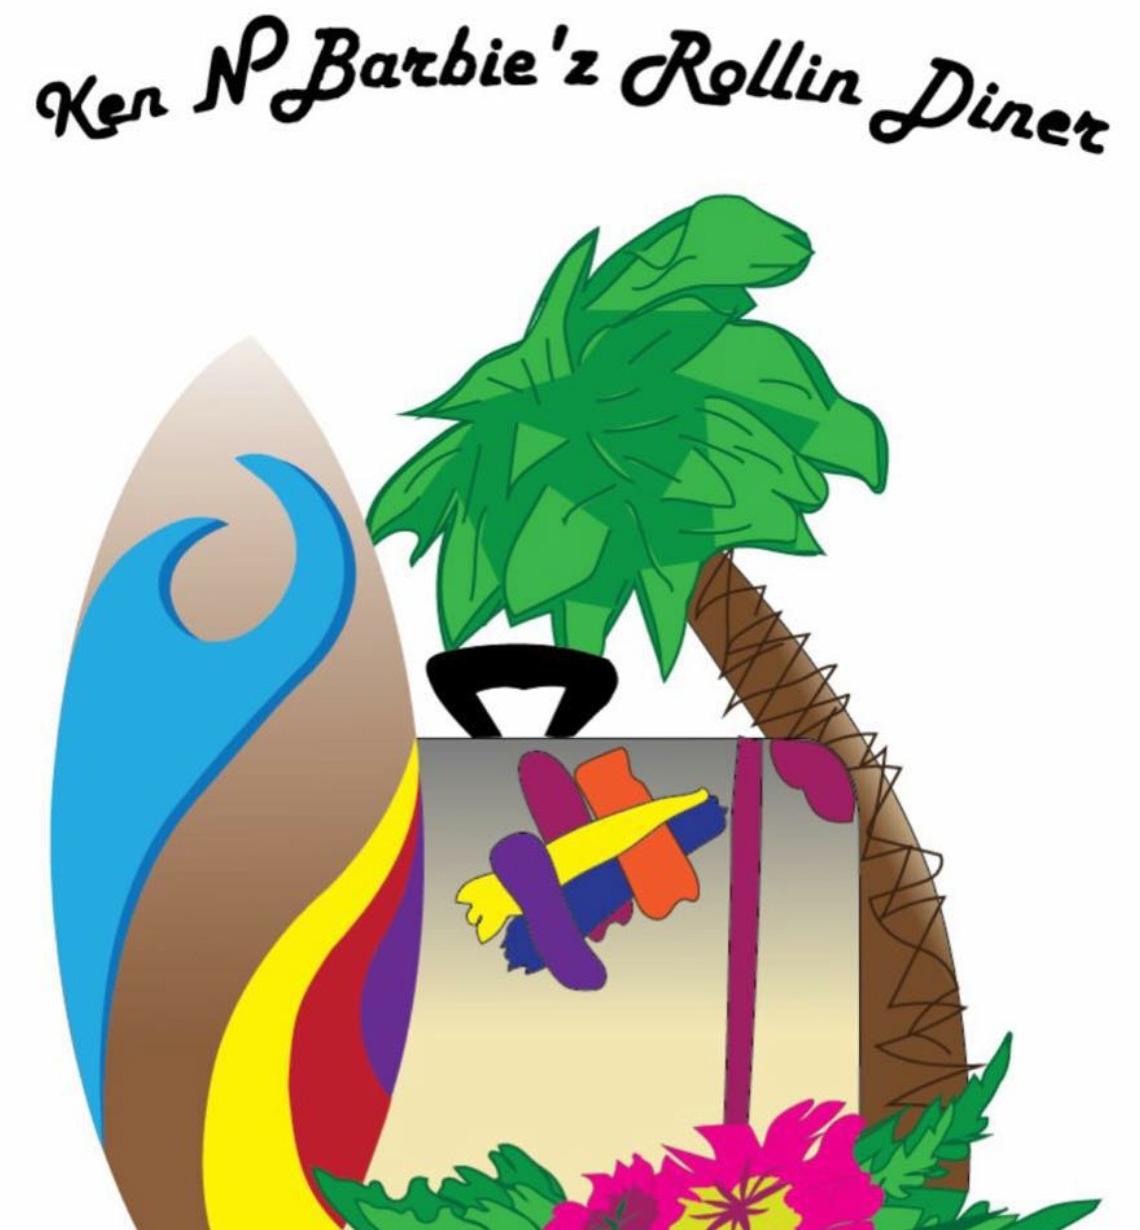 Ken-n-Barbiez Rollin Diner.jpg